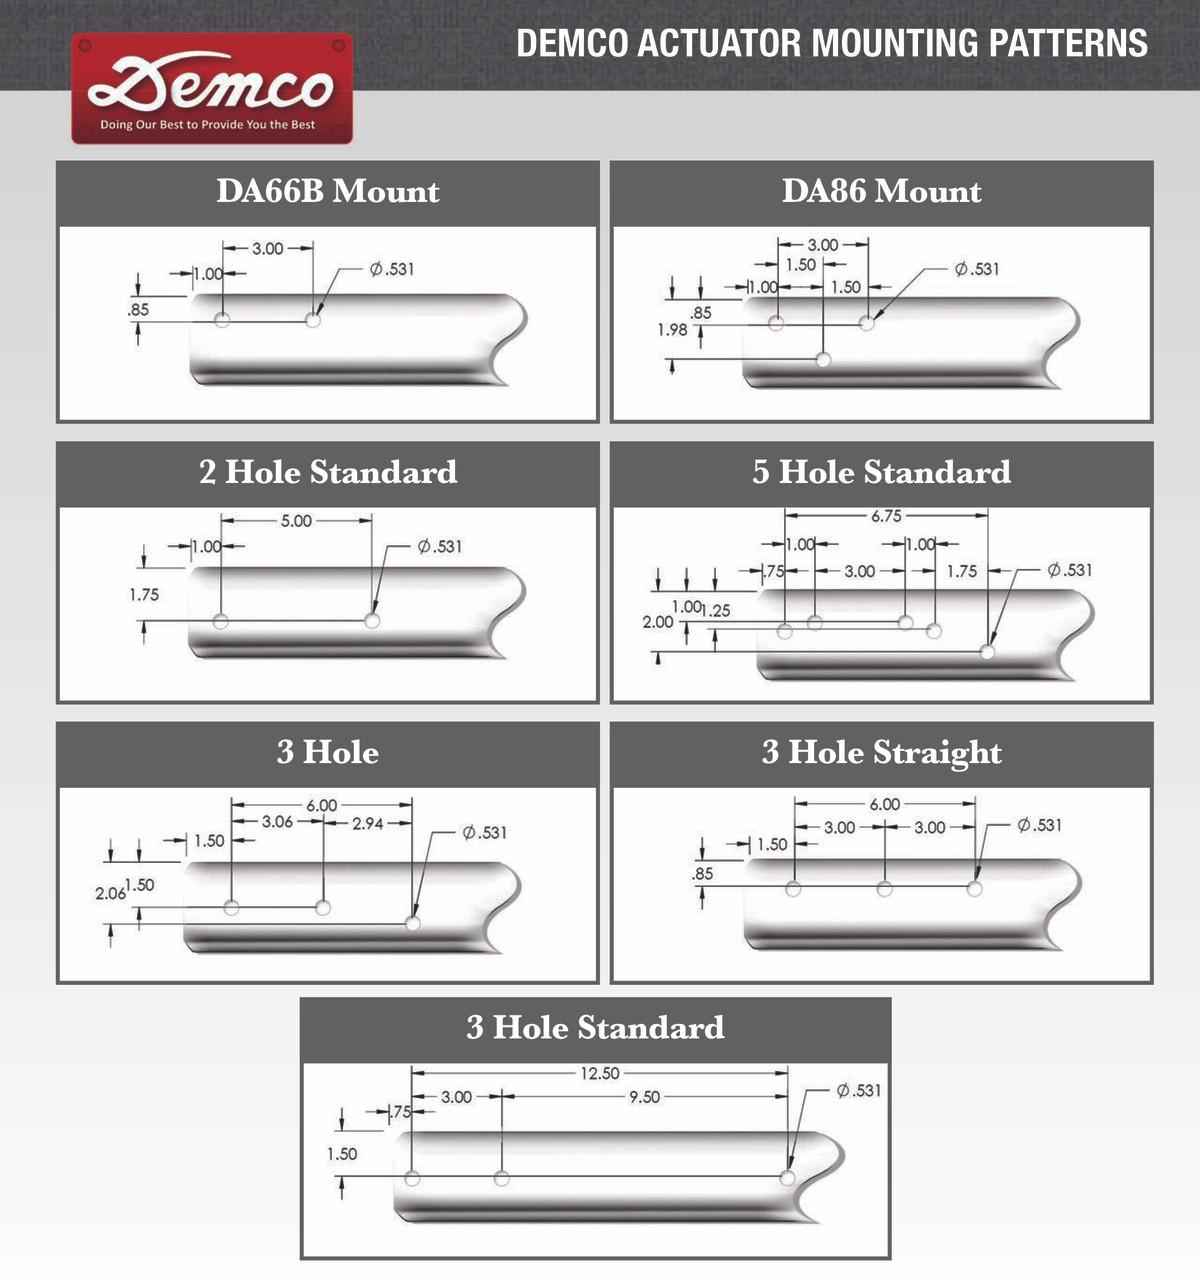 8759122 --- Demco Hydraulic Brake Actuator with Centered Channel - 8,000 lb Capacity - Model DA91